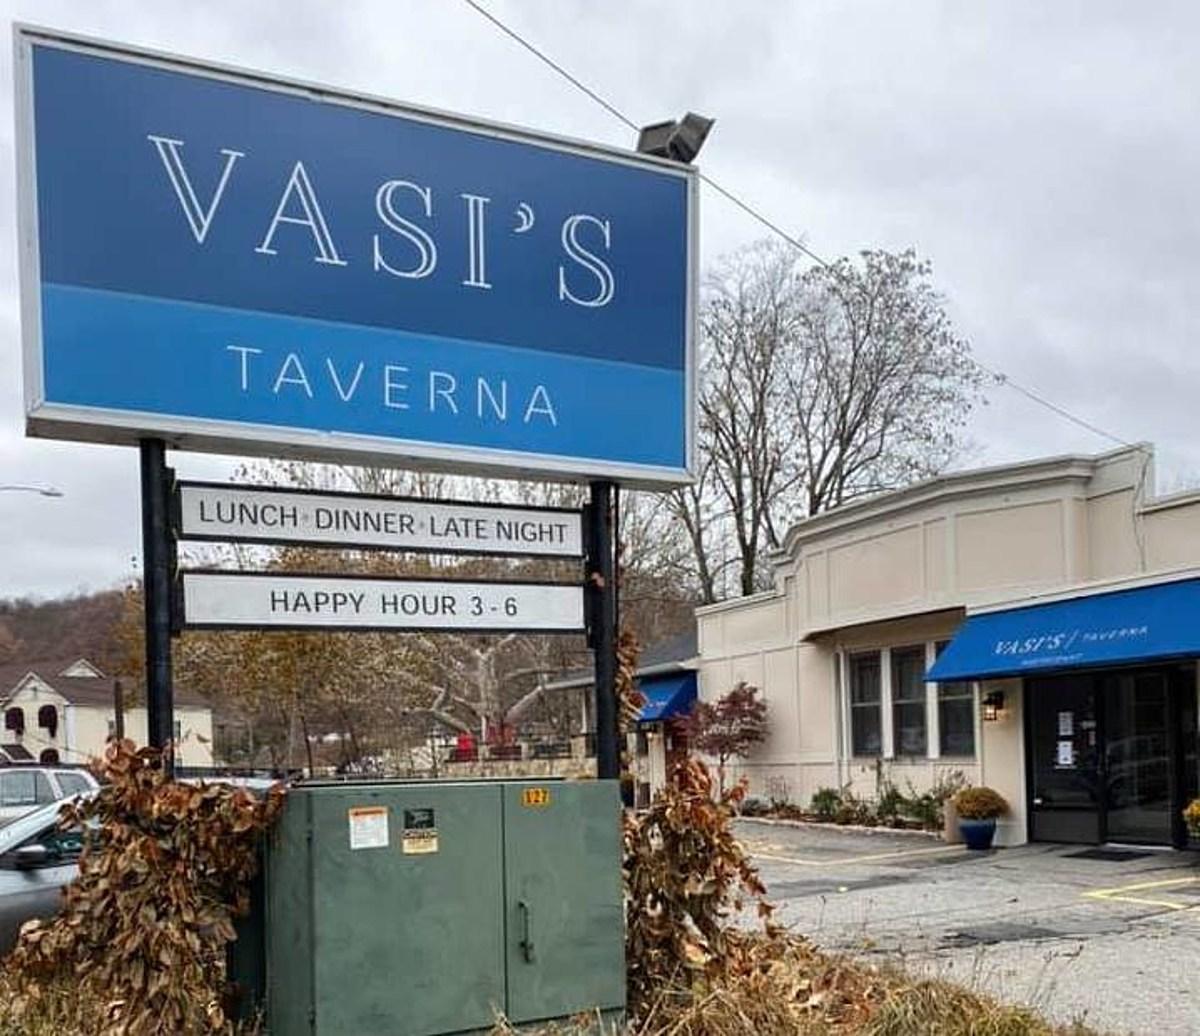 Vasis Halloween 2020 Vasi's Taverna Closes After 18 Years in Business